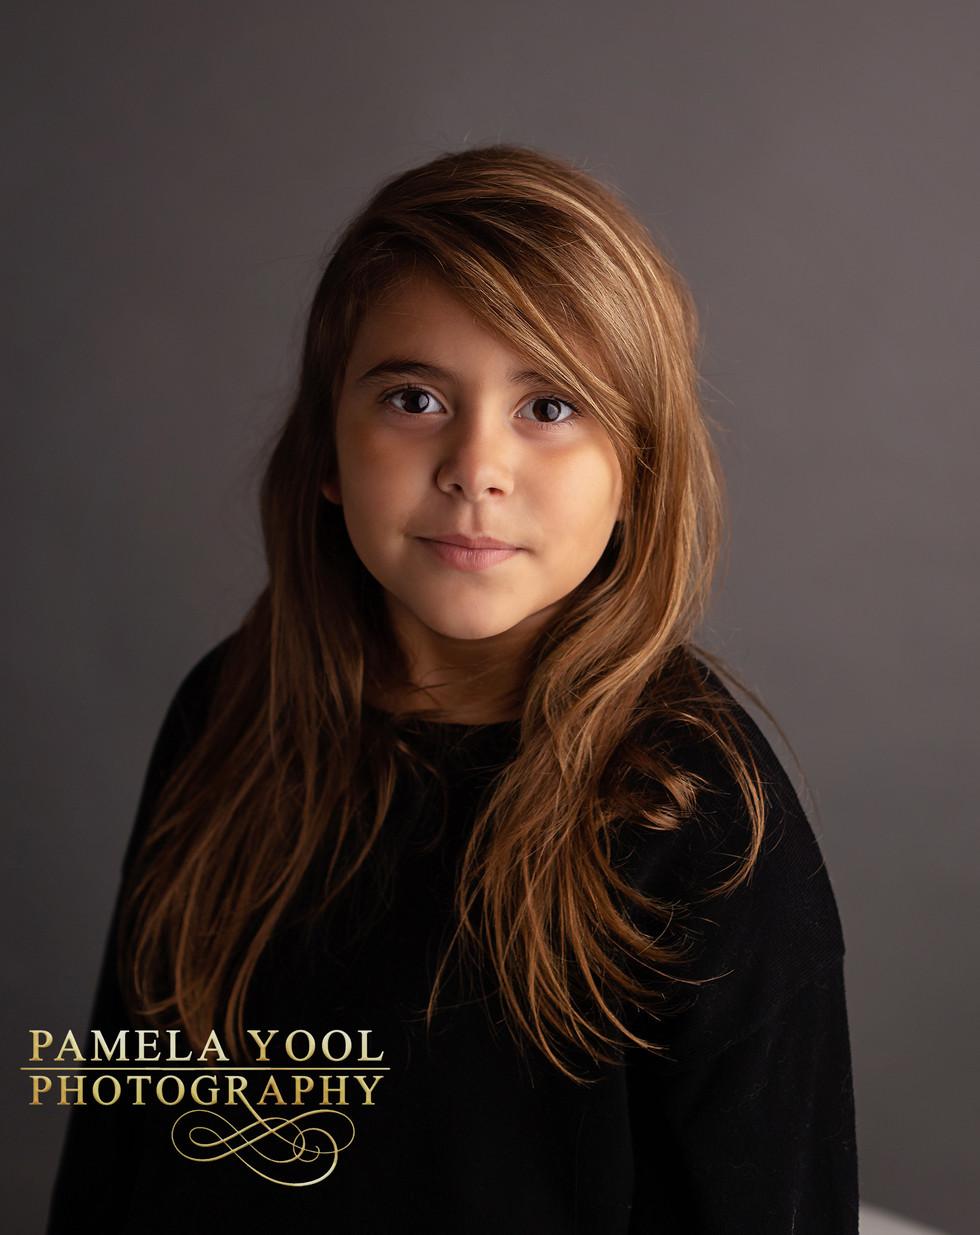 Pamela-Yool-Photography-9920-FB.jpg